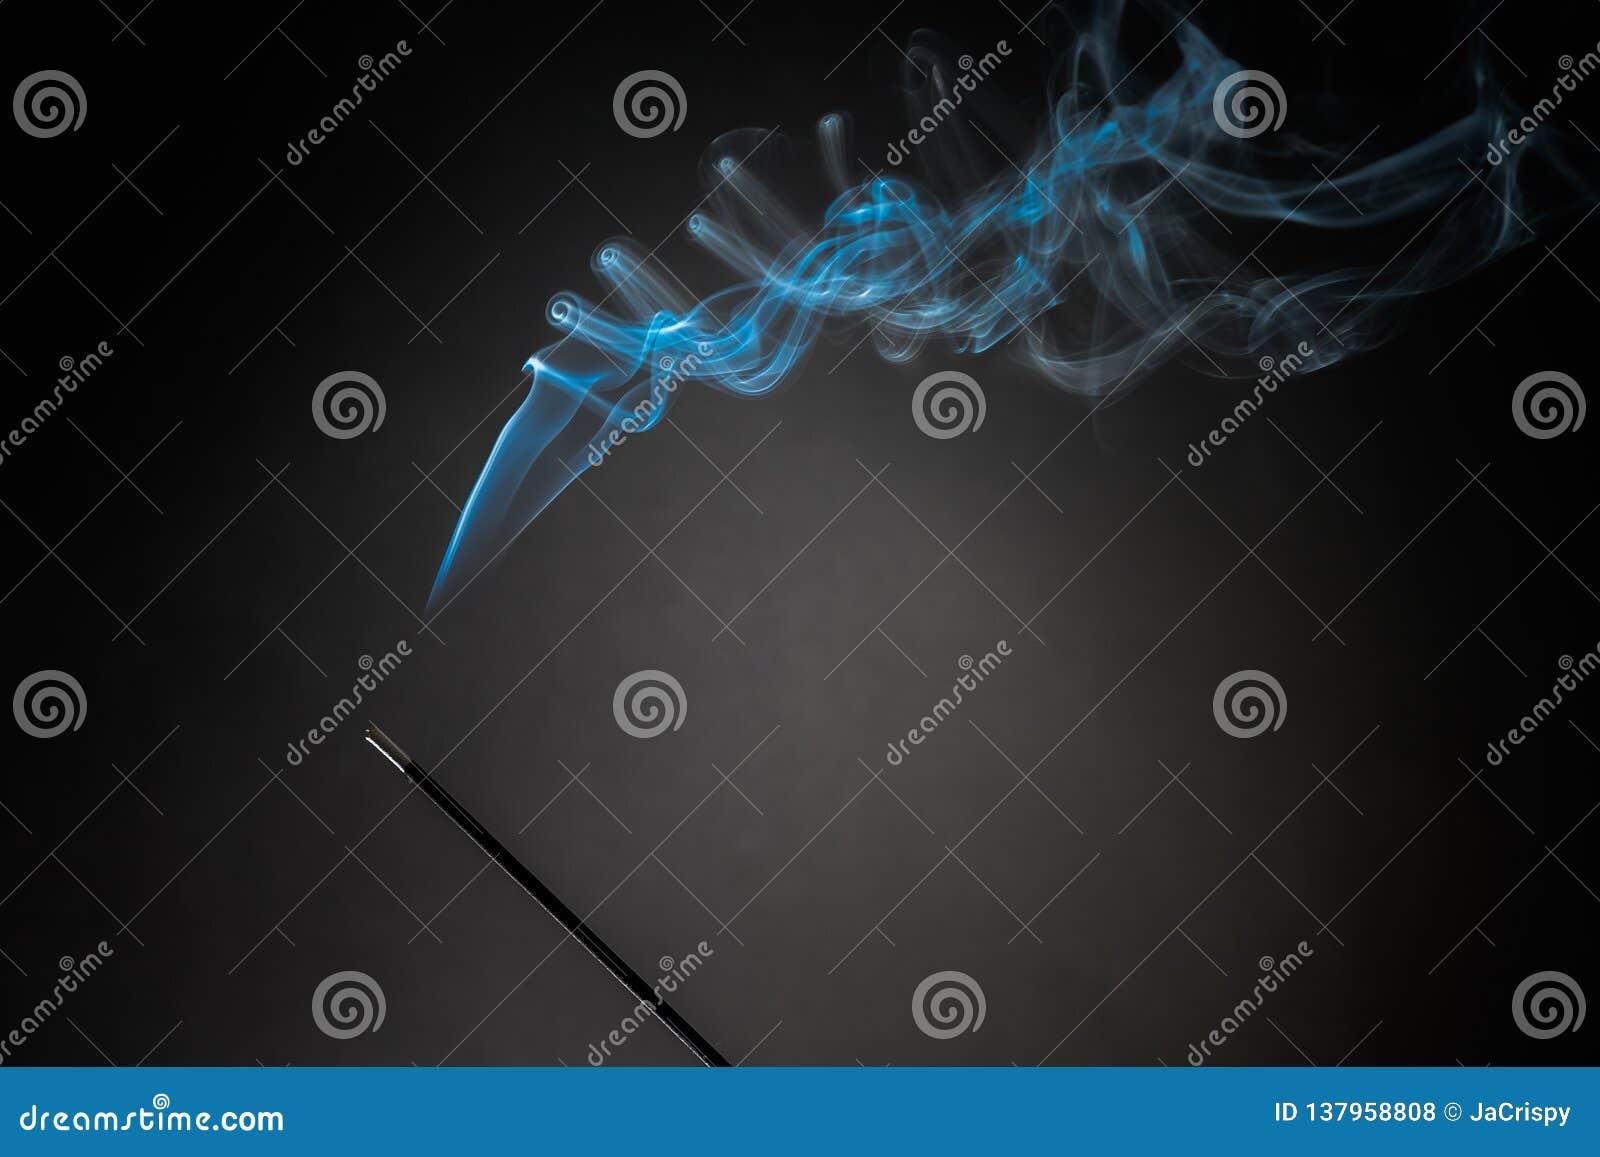 Smoking Incense Stick With Smoke Going Up On Black